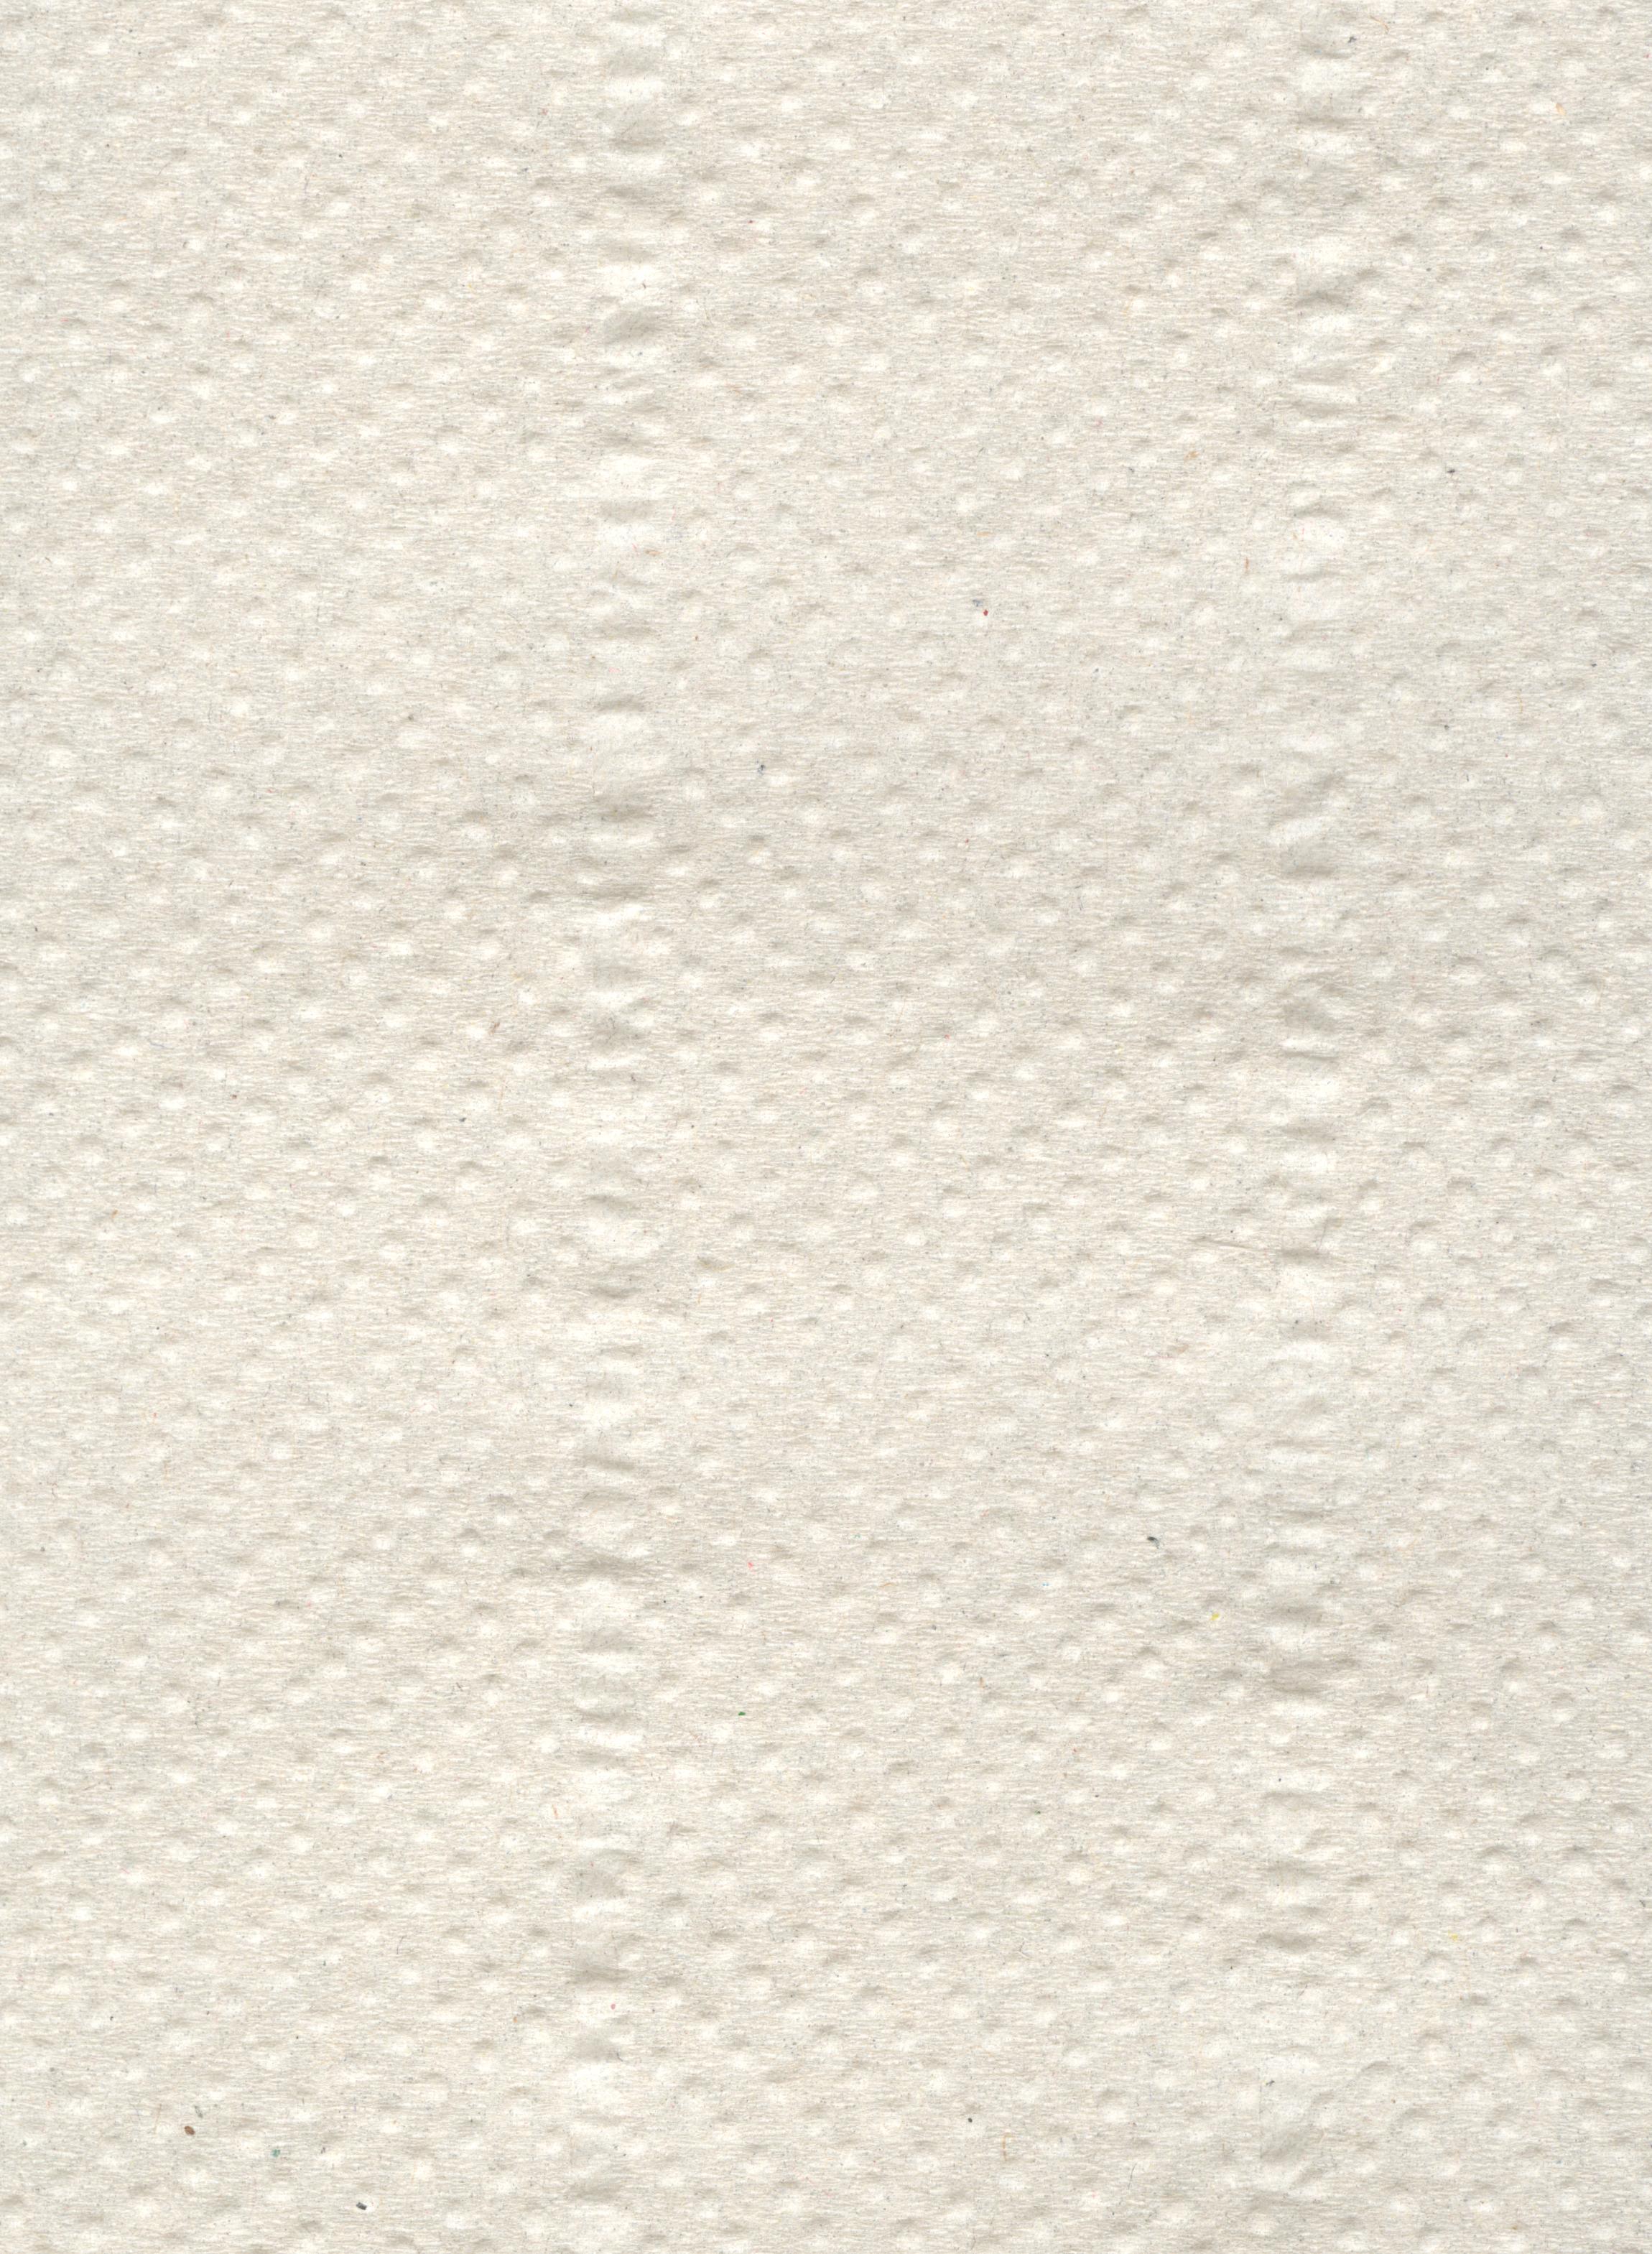 fabrics texture kinkyfriend paper white